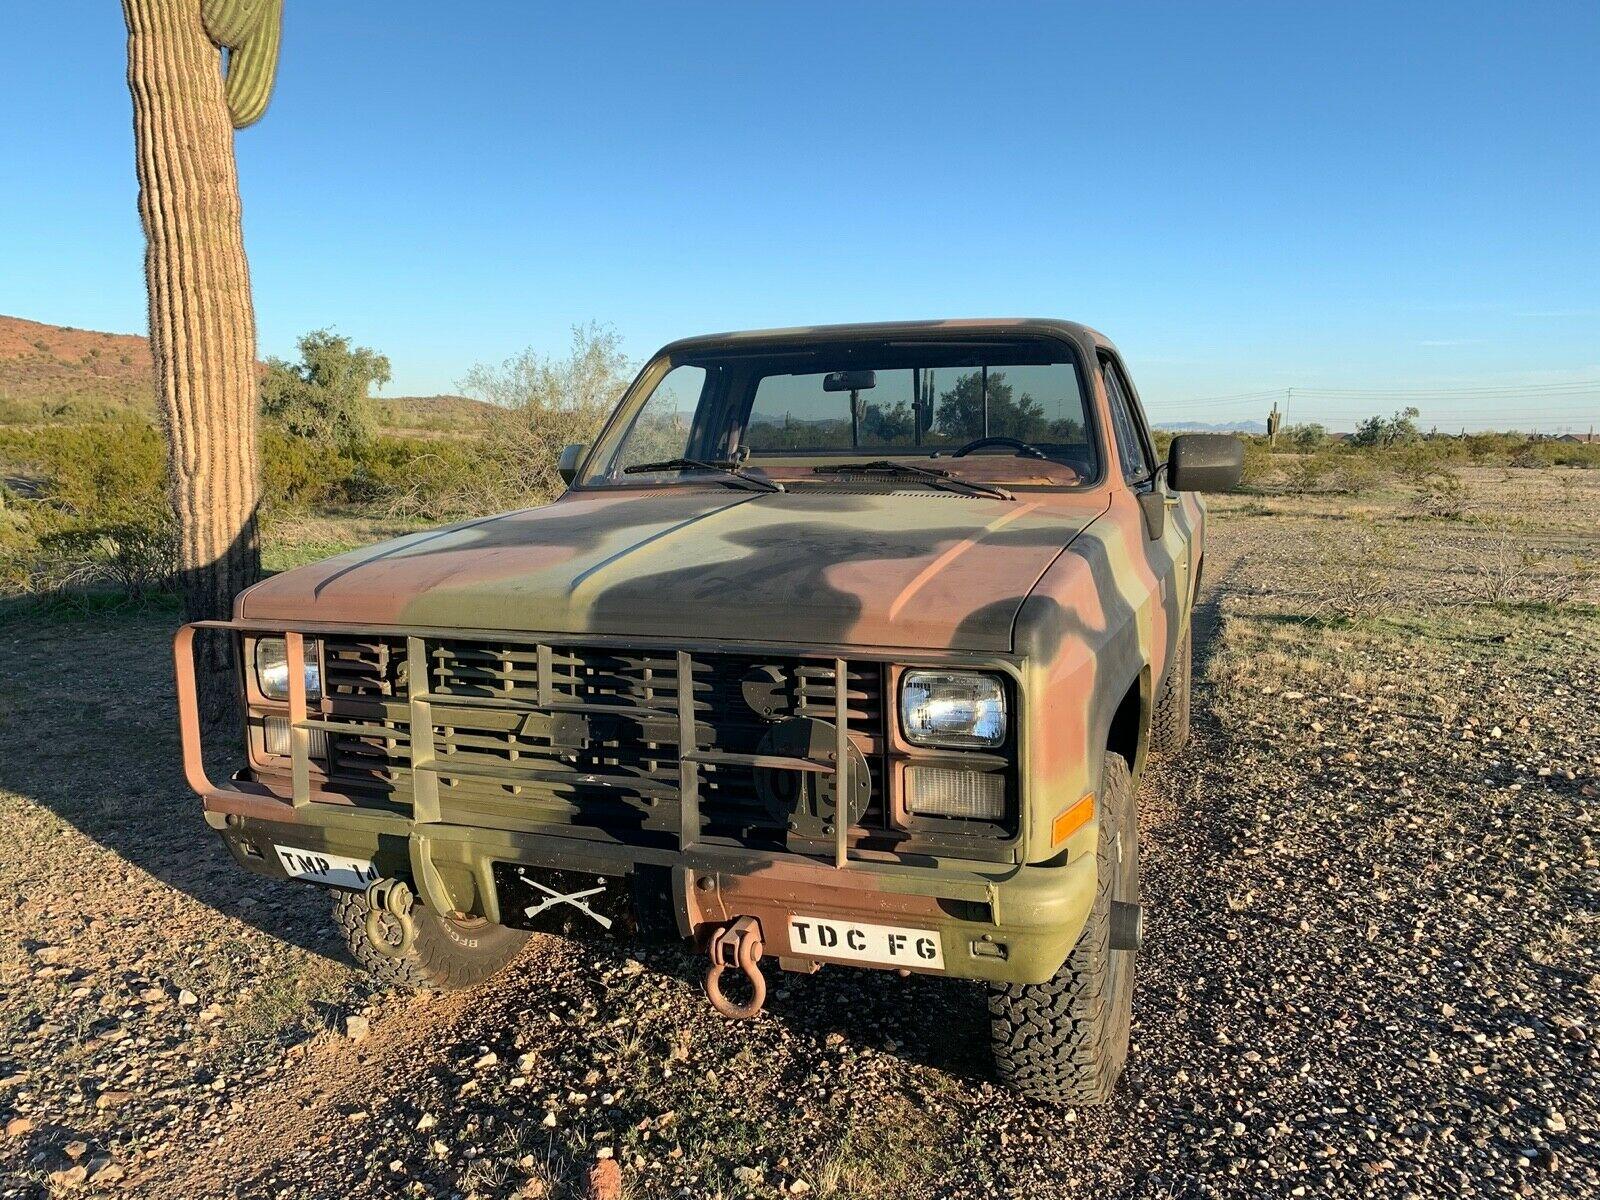 greyt shape 1986 Chevrolet 4×4 5/4 Ton M1008 CUCV military